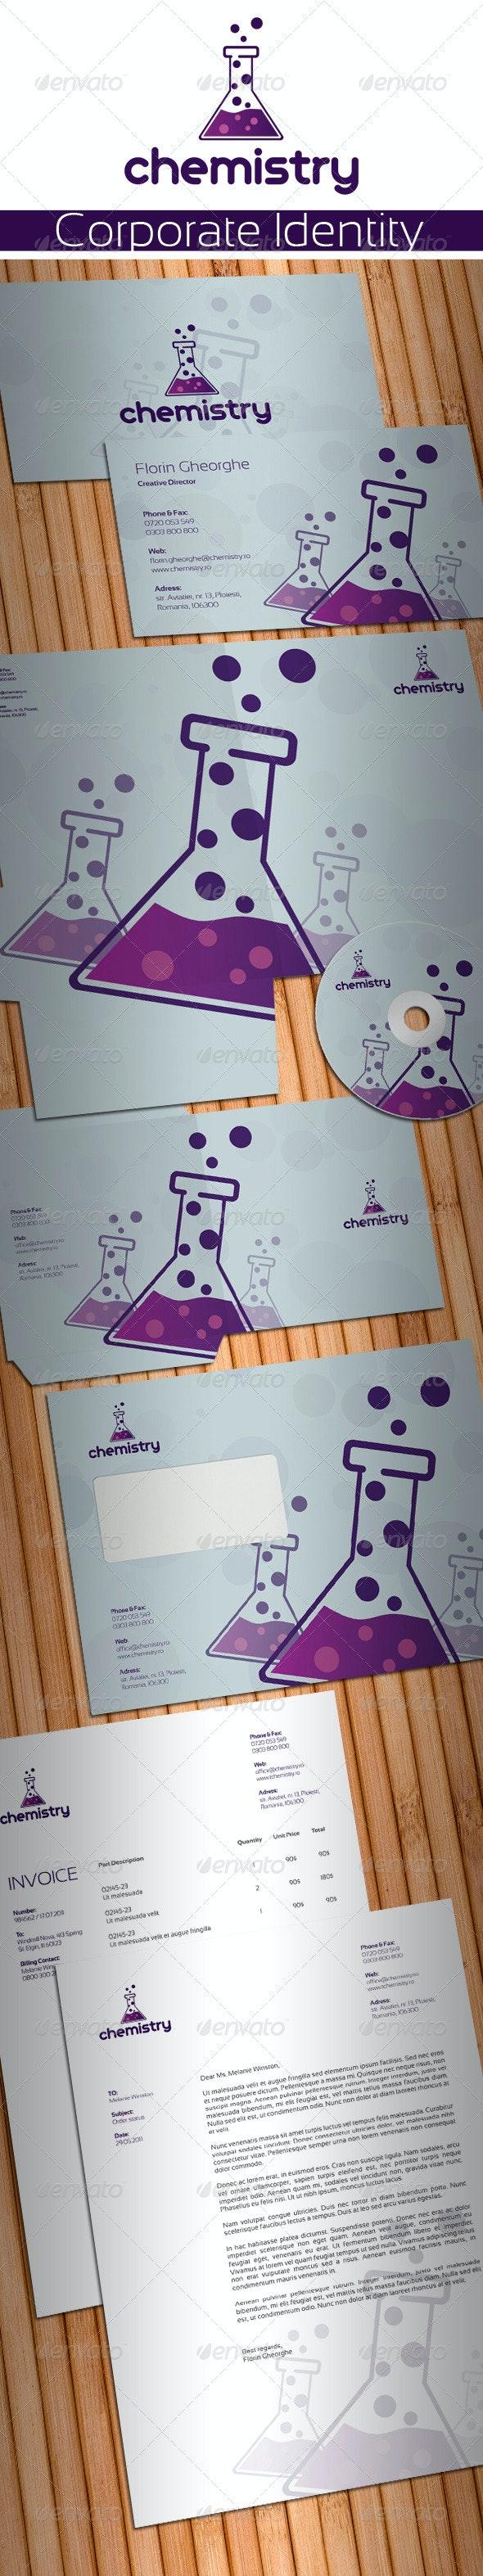 Chemistry Laboratory Stationery - Stationery Print Templates